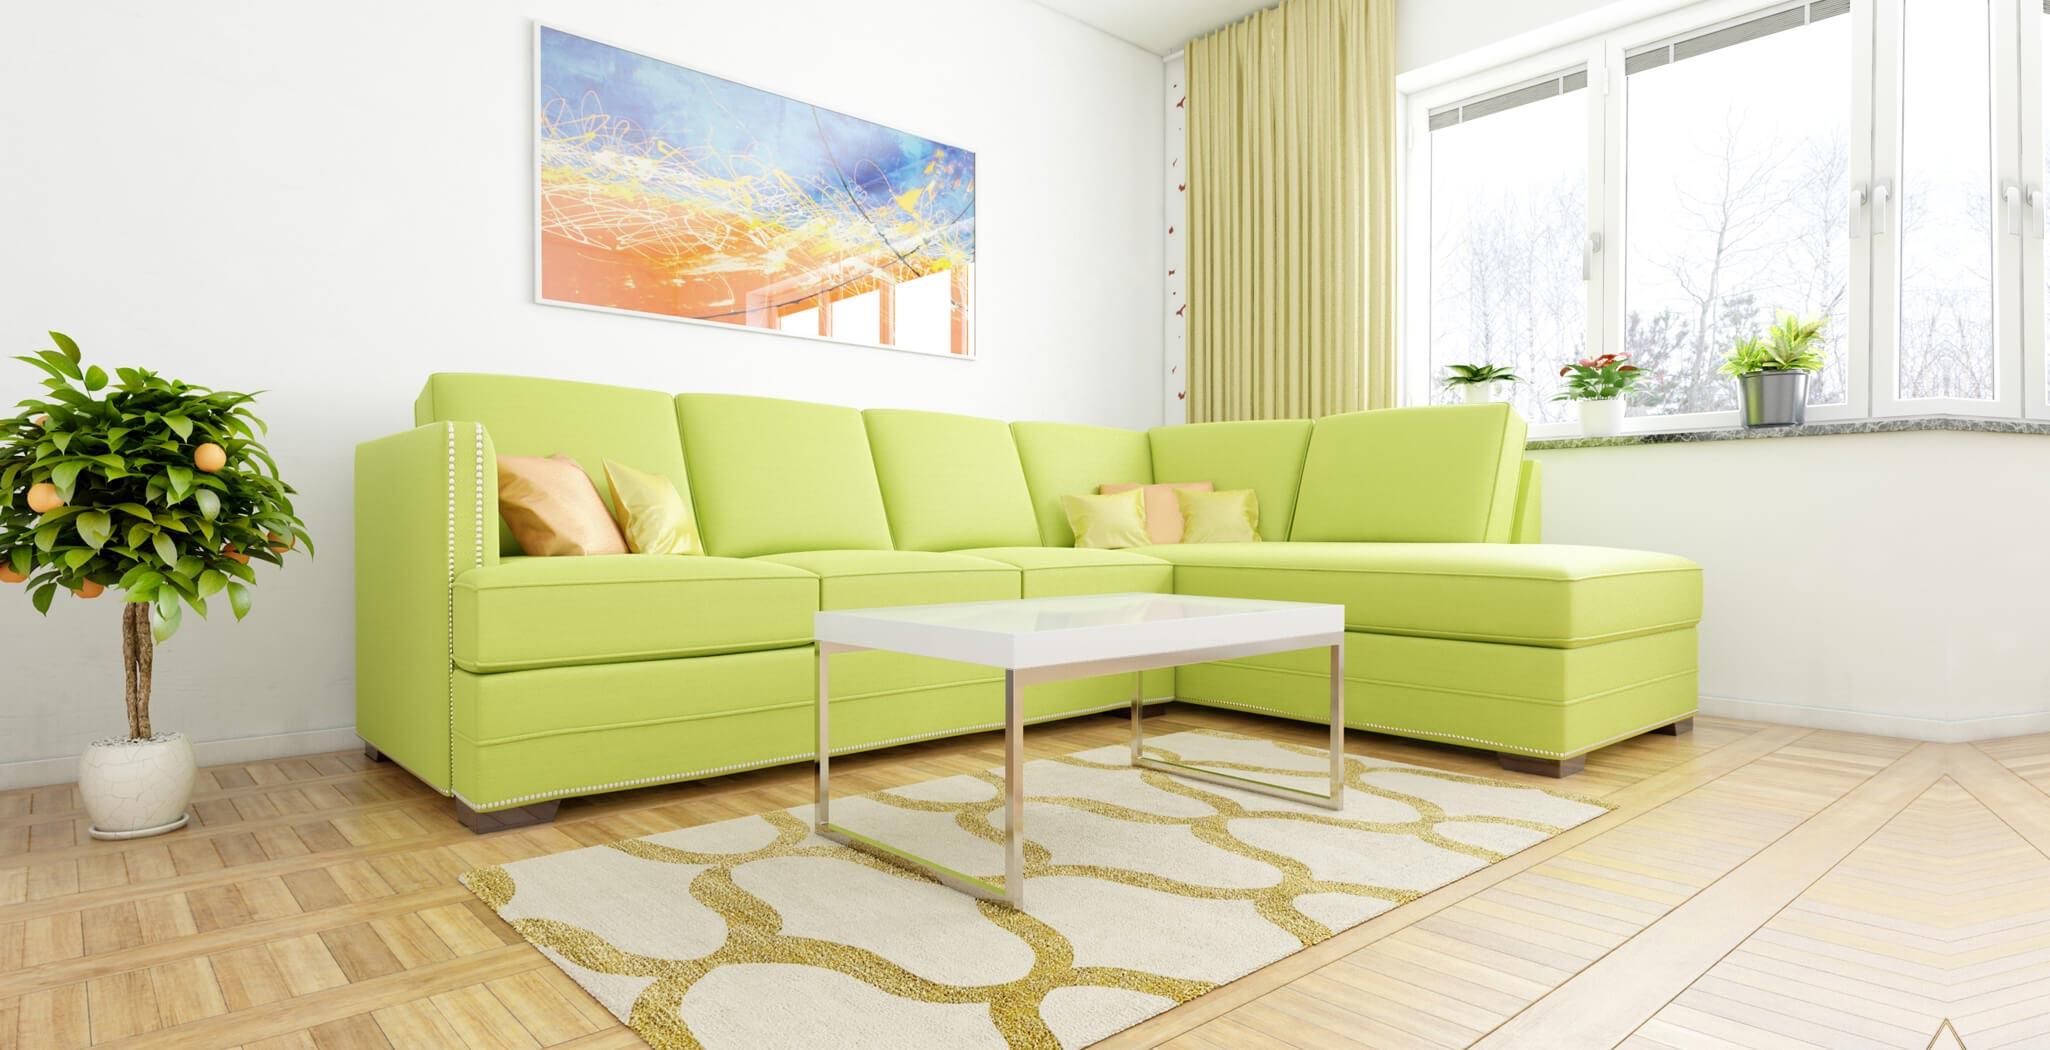 riga panel furniture gallery 3